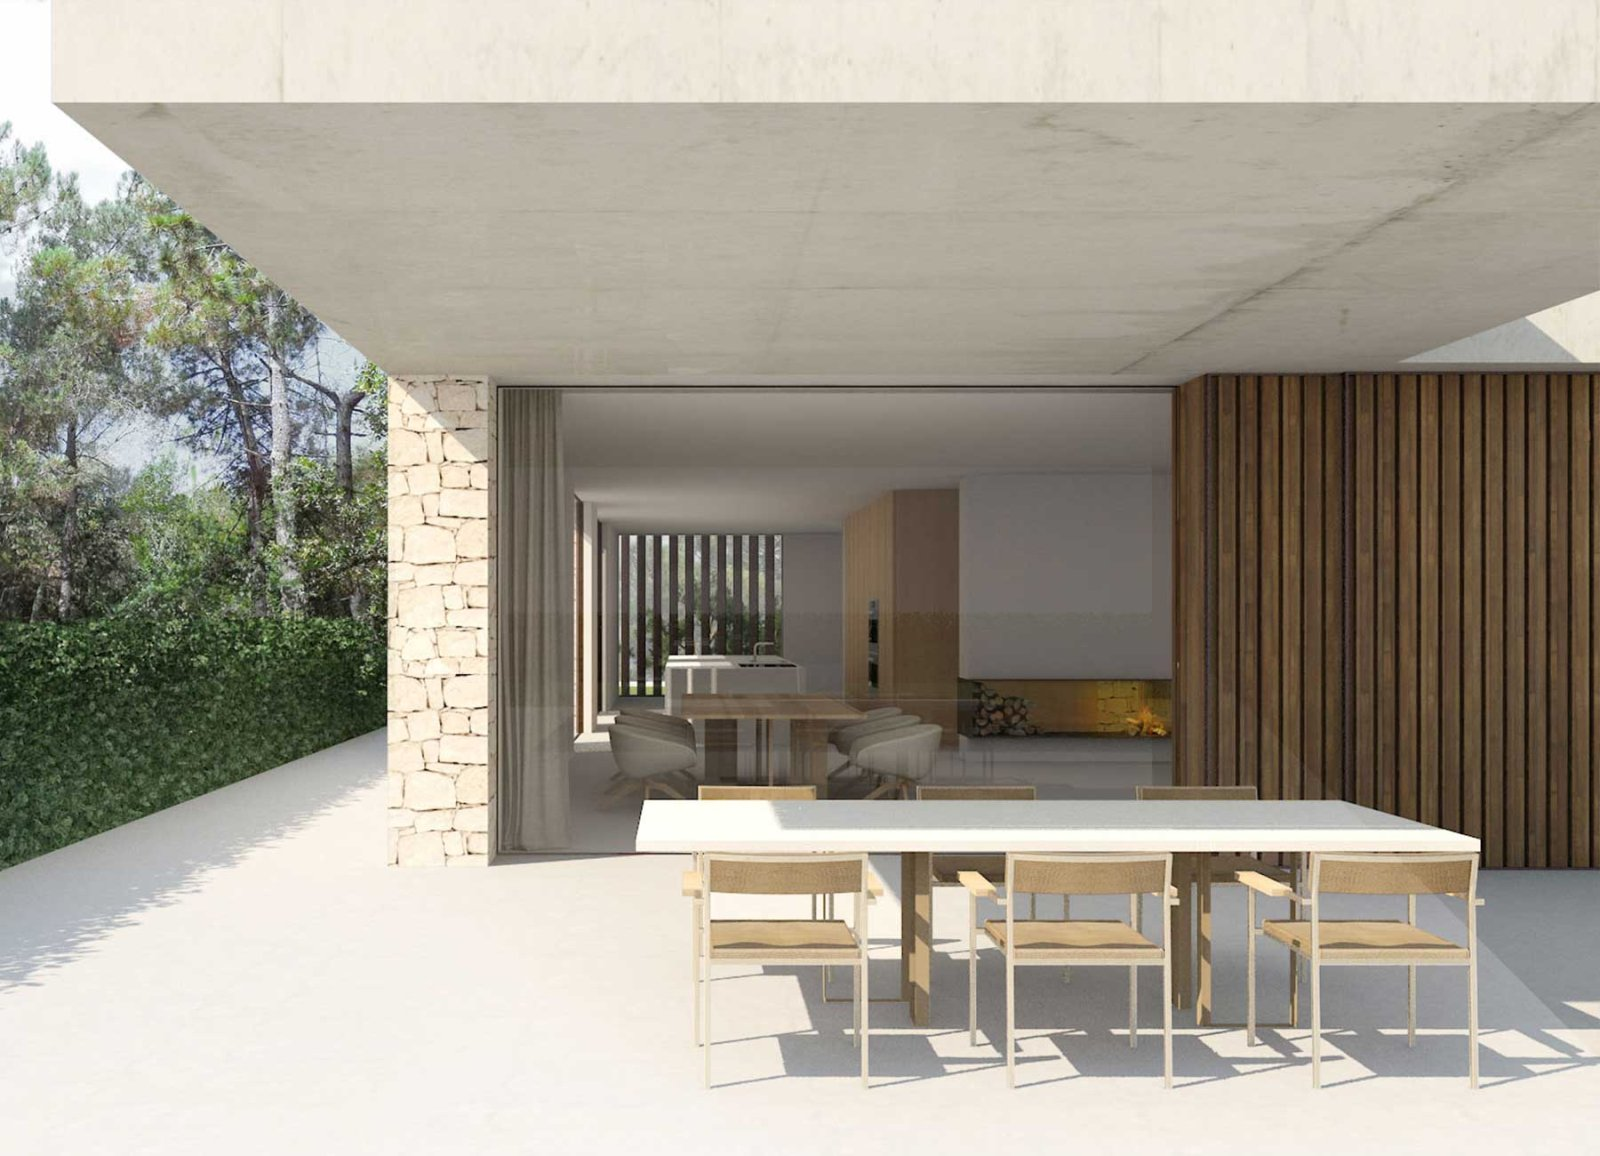 The house in La Cañada